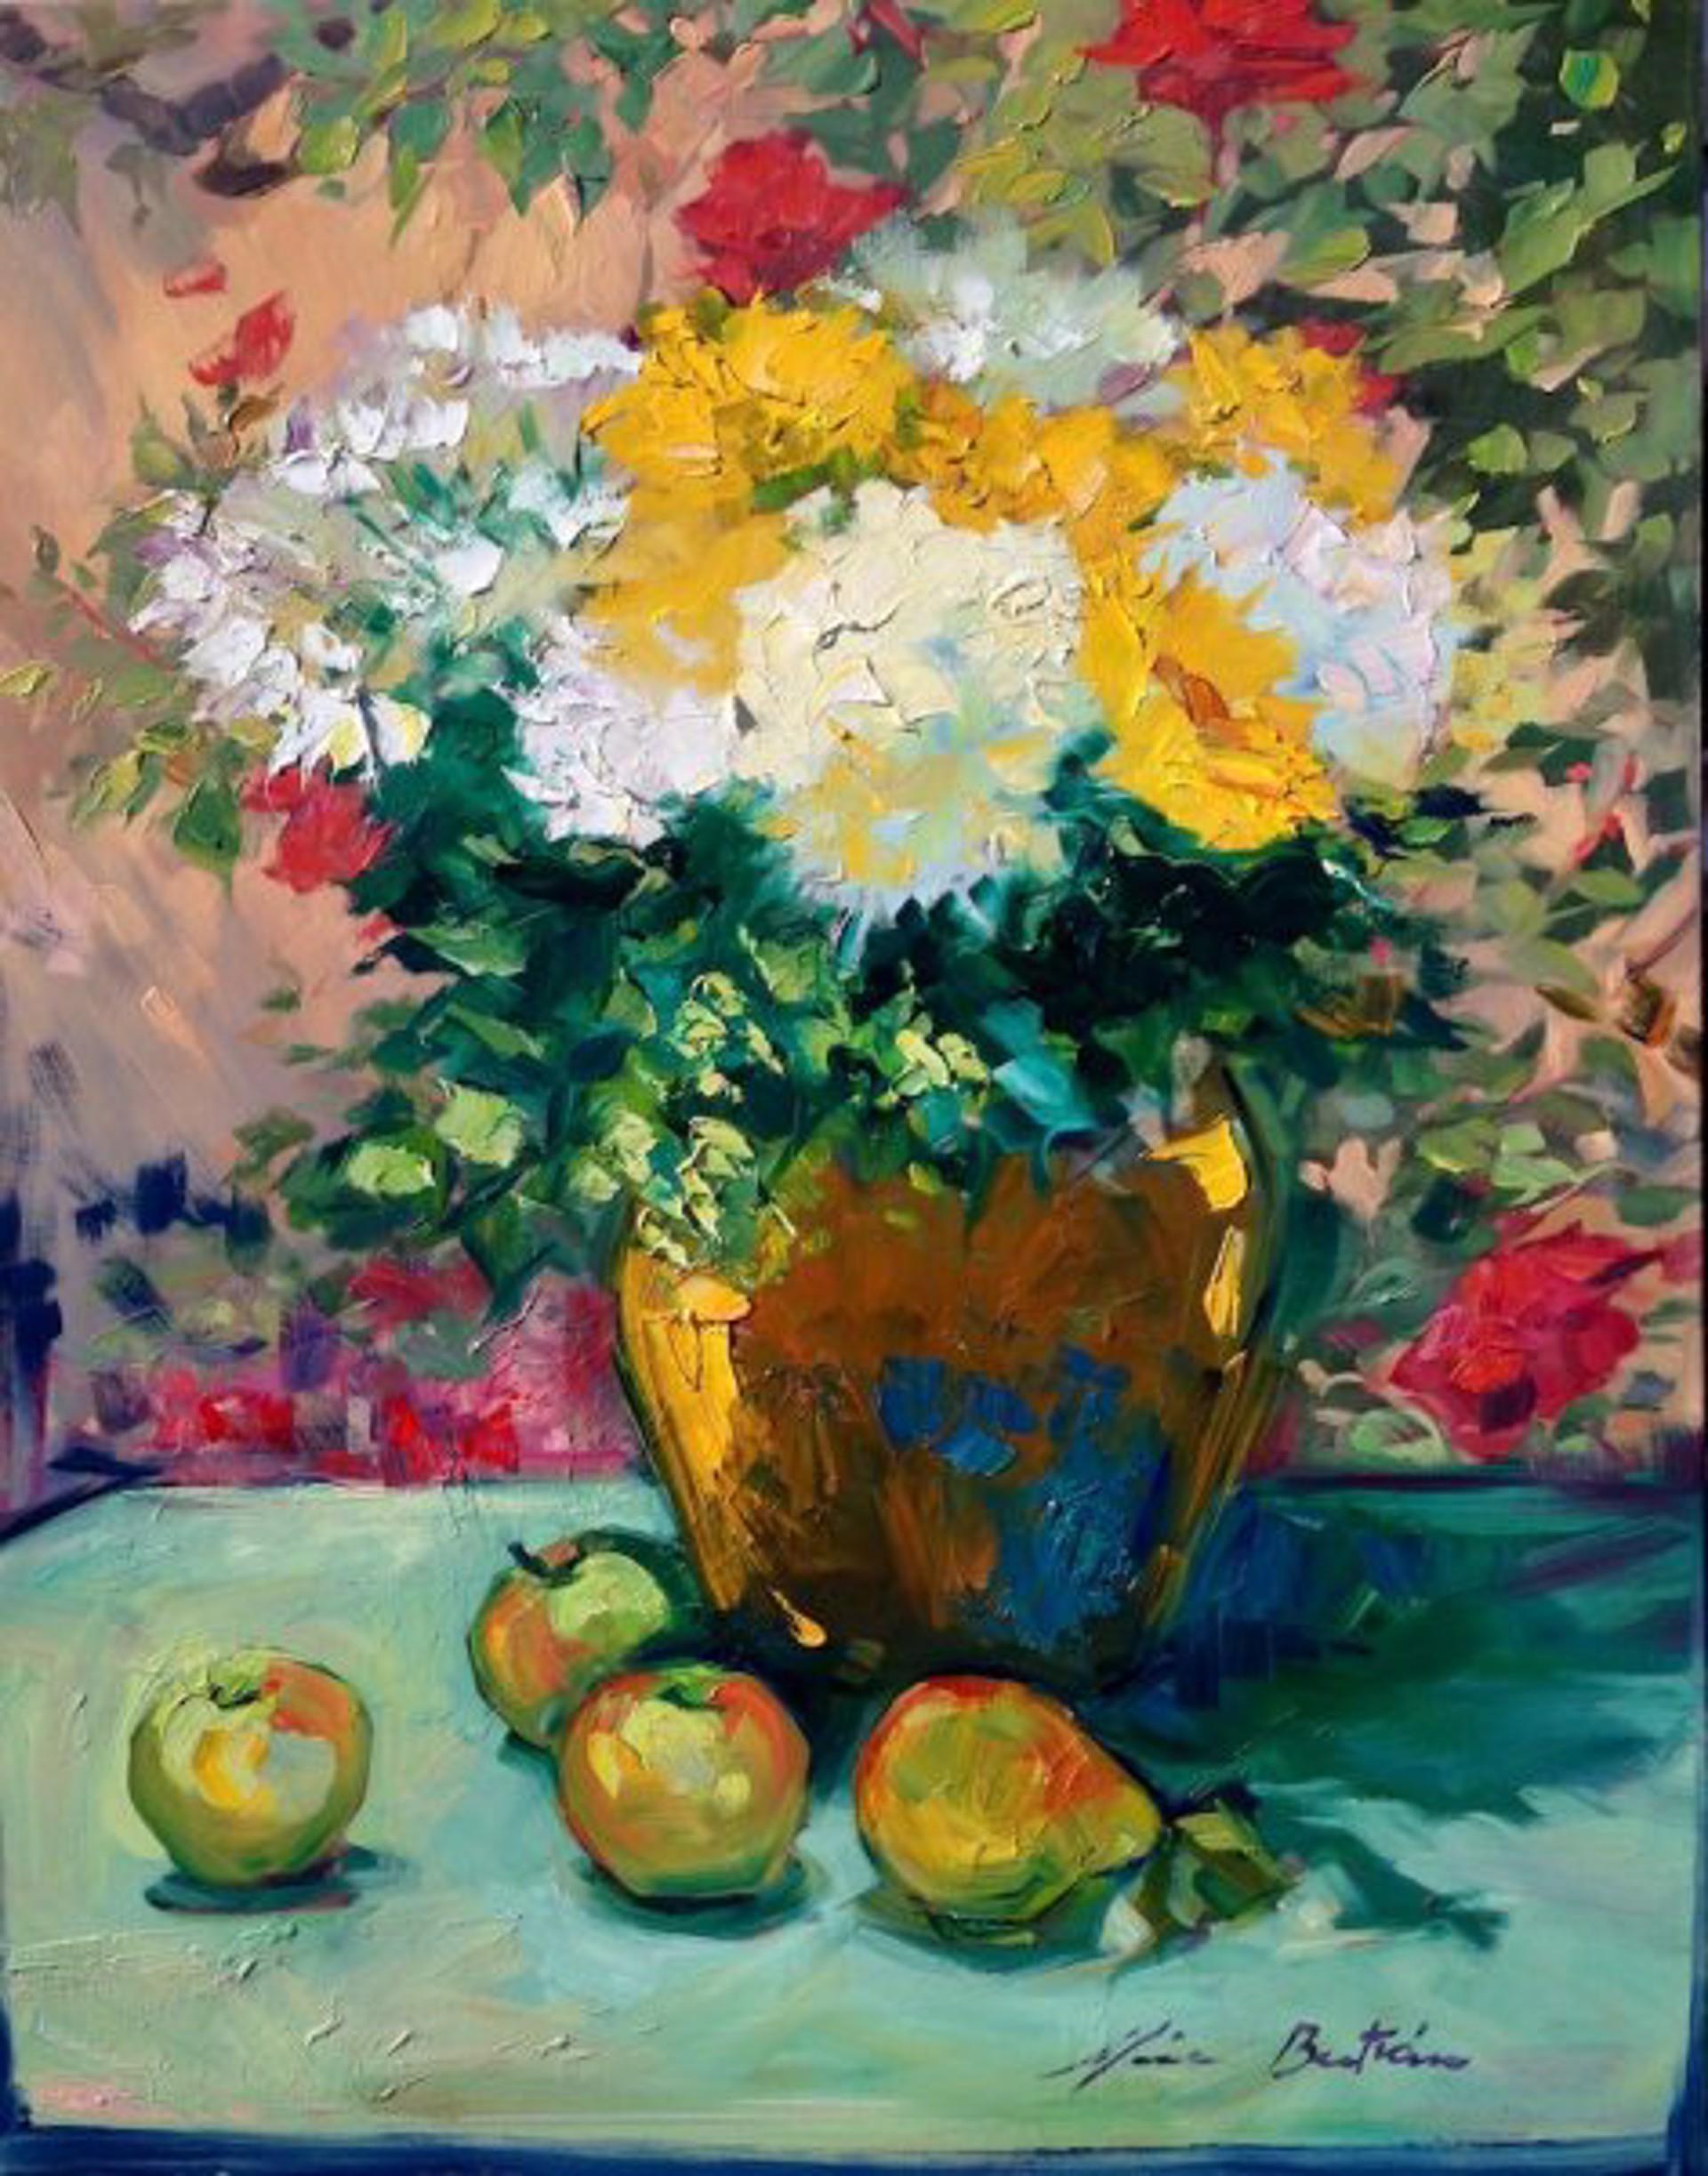 Hydrangeas And Sunflowers by Maria Bertrán